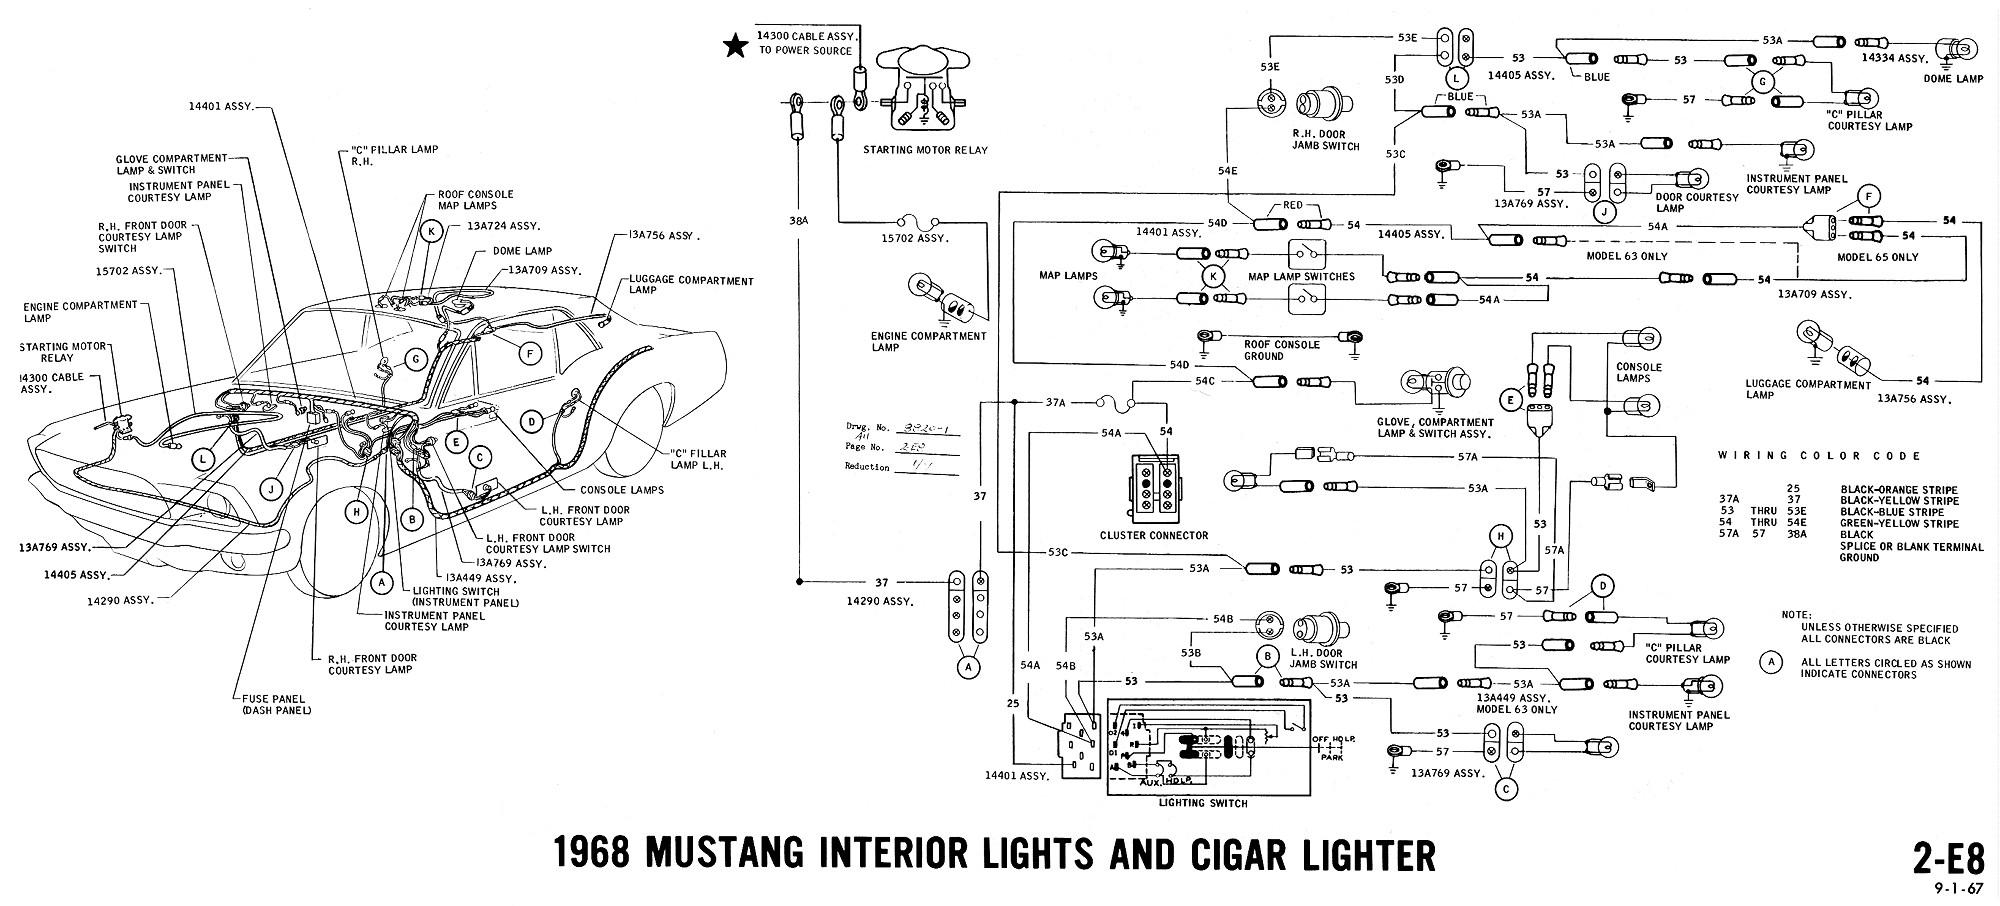 1968 ford mustang wiring diagram box wiring diagram 1968 mustang wiring diagram manual 1968 mustang wiring diagram #3